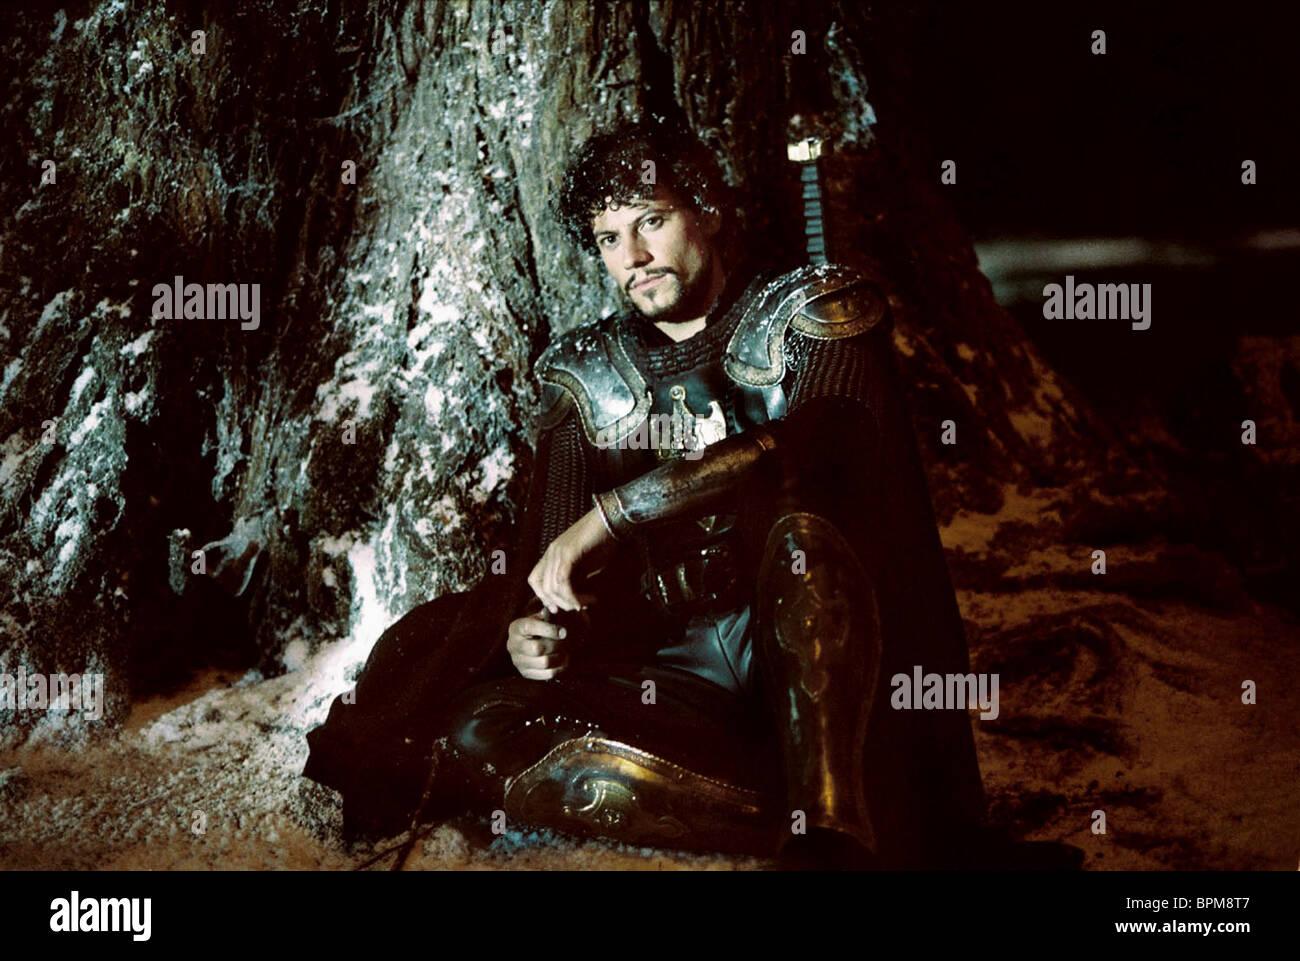 Ioan Gruffudd King Arthur 2004 Stock Photo Alamy